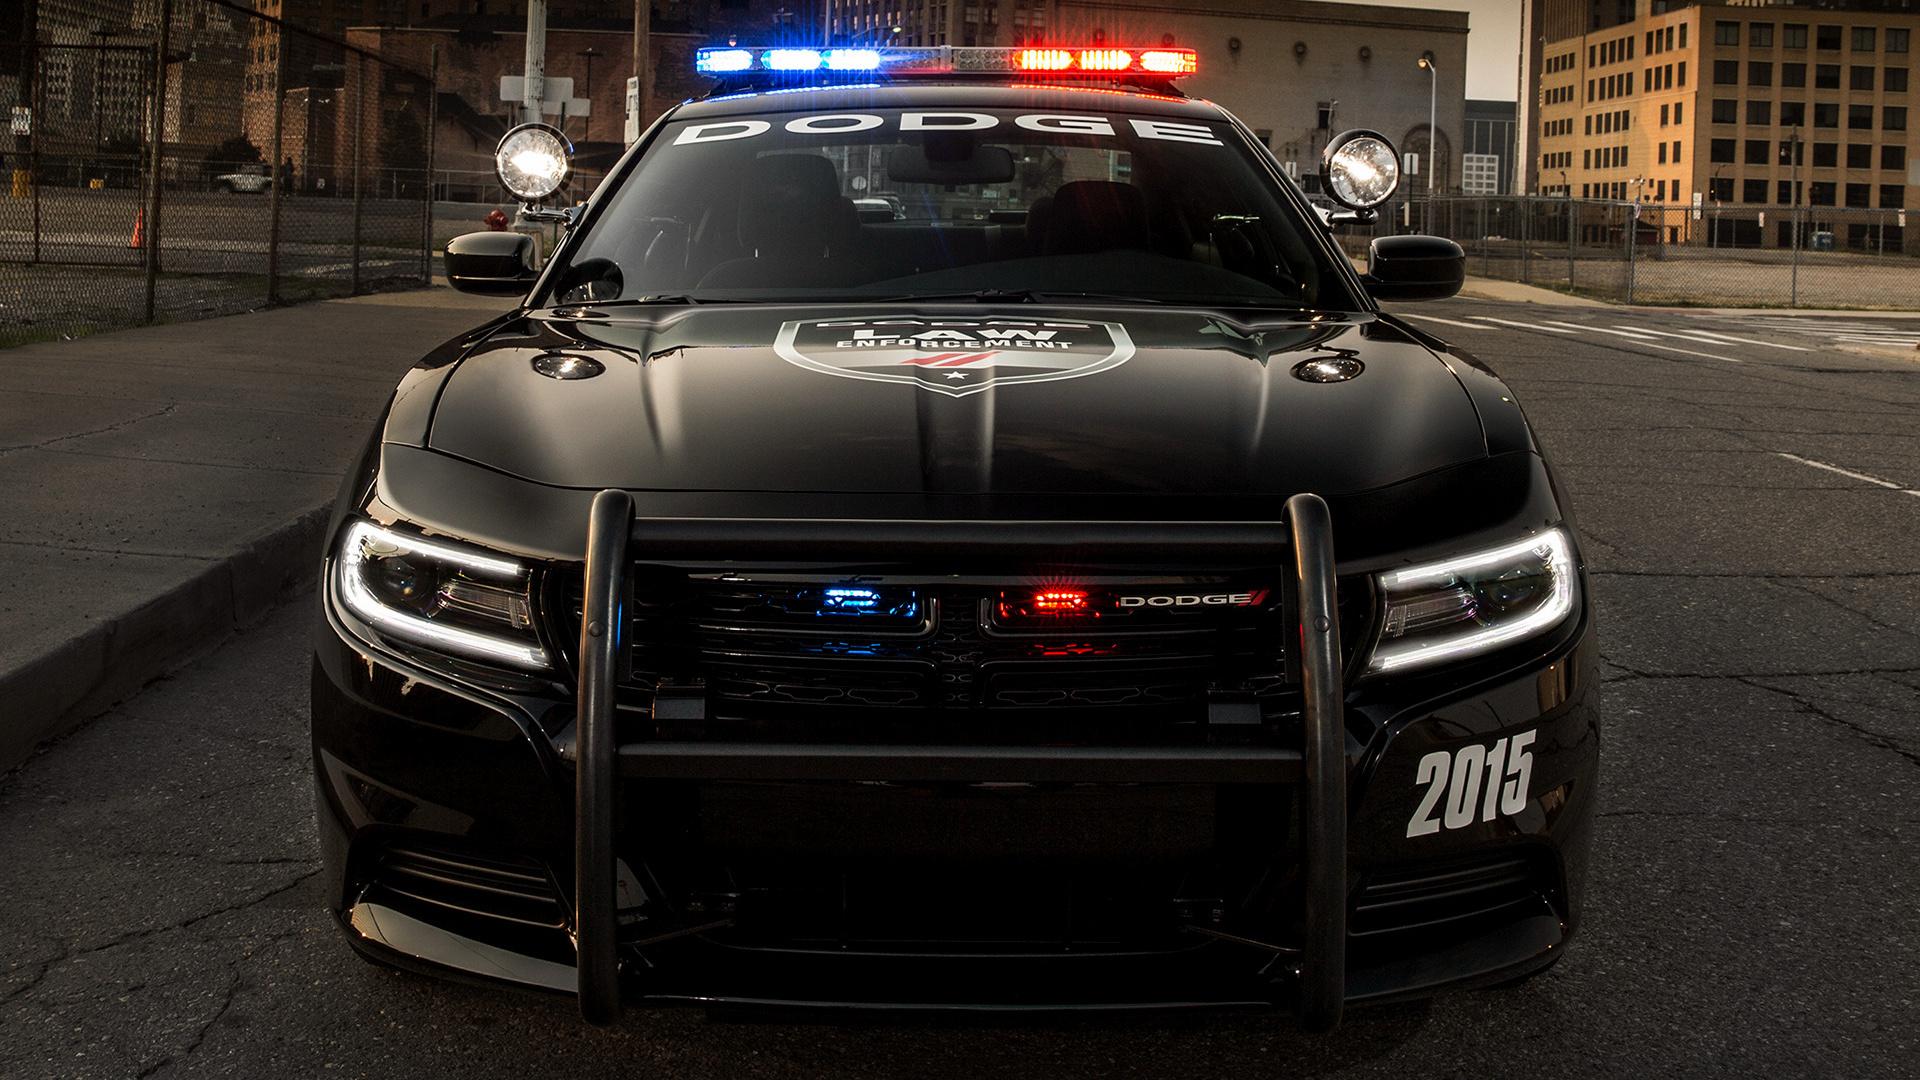 2015 Dodge Charger Pursuit Awd